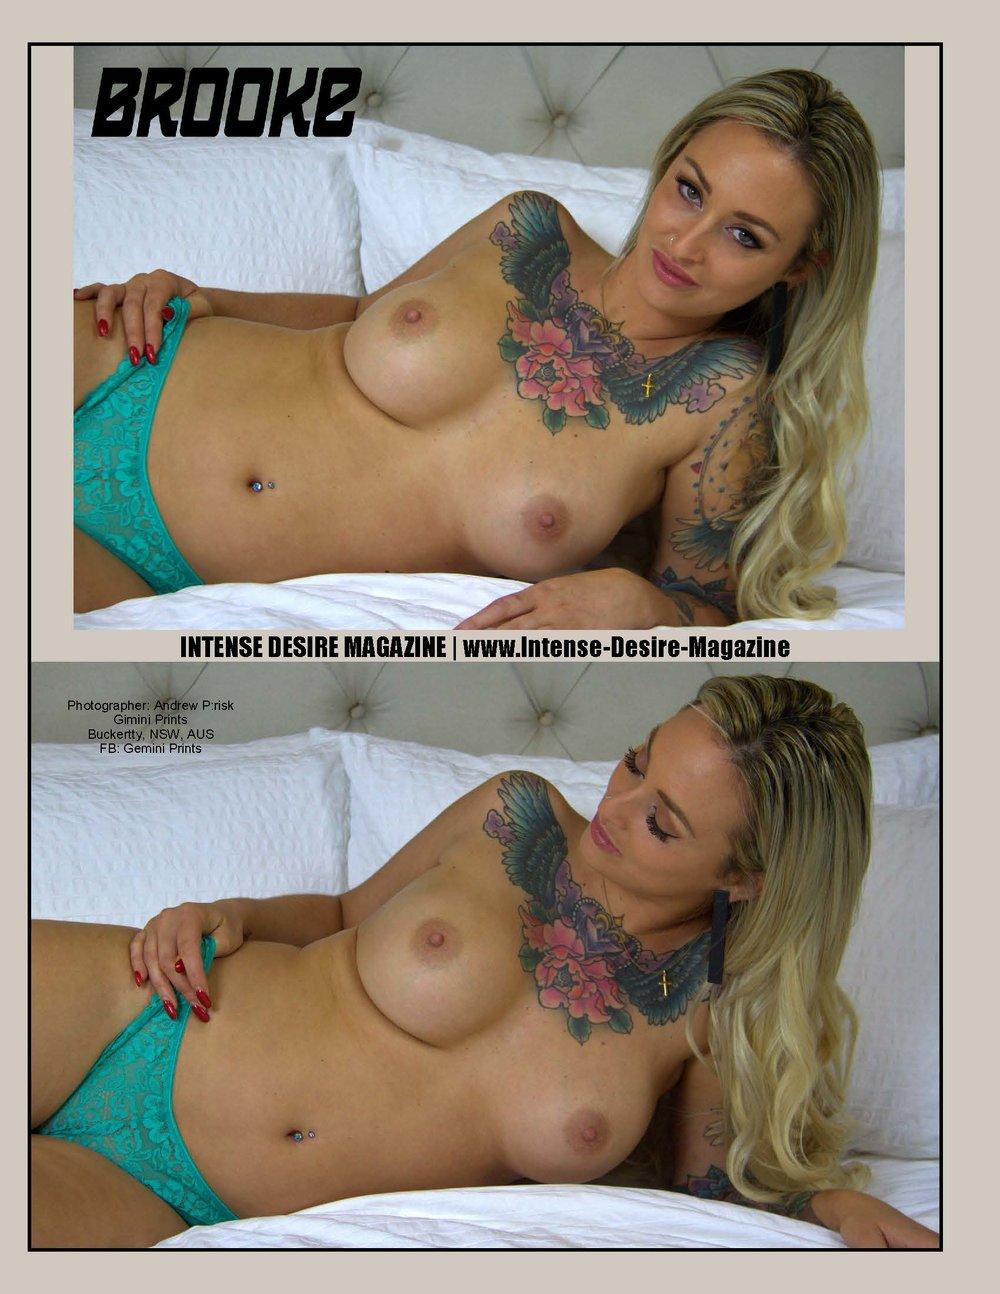 Brooke - Australia